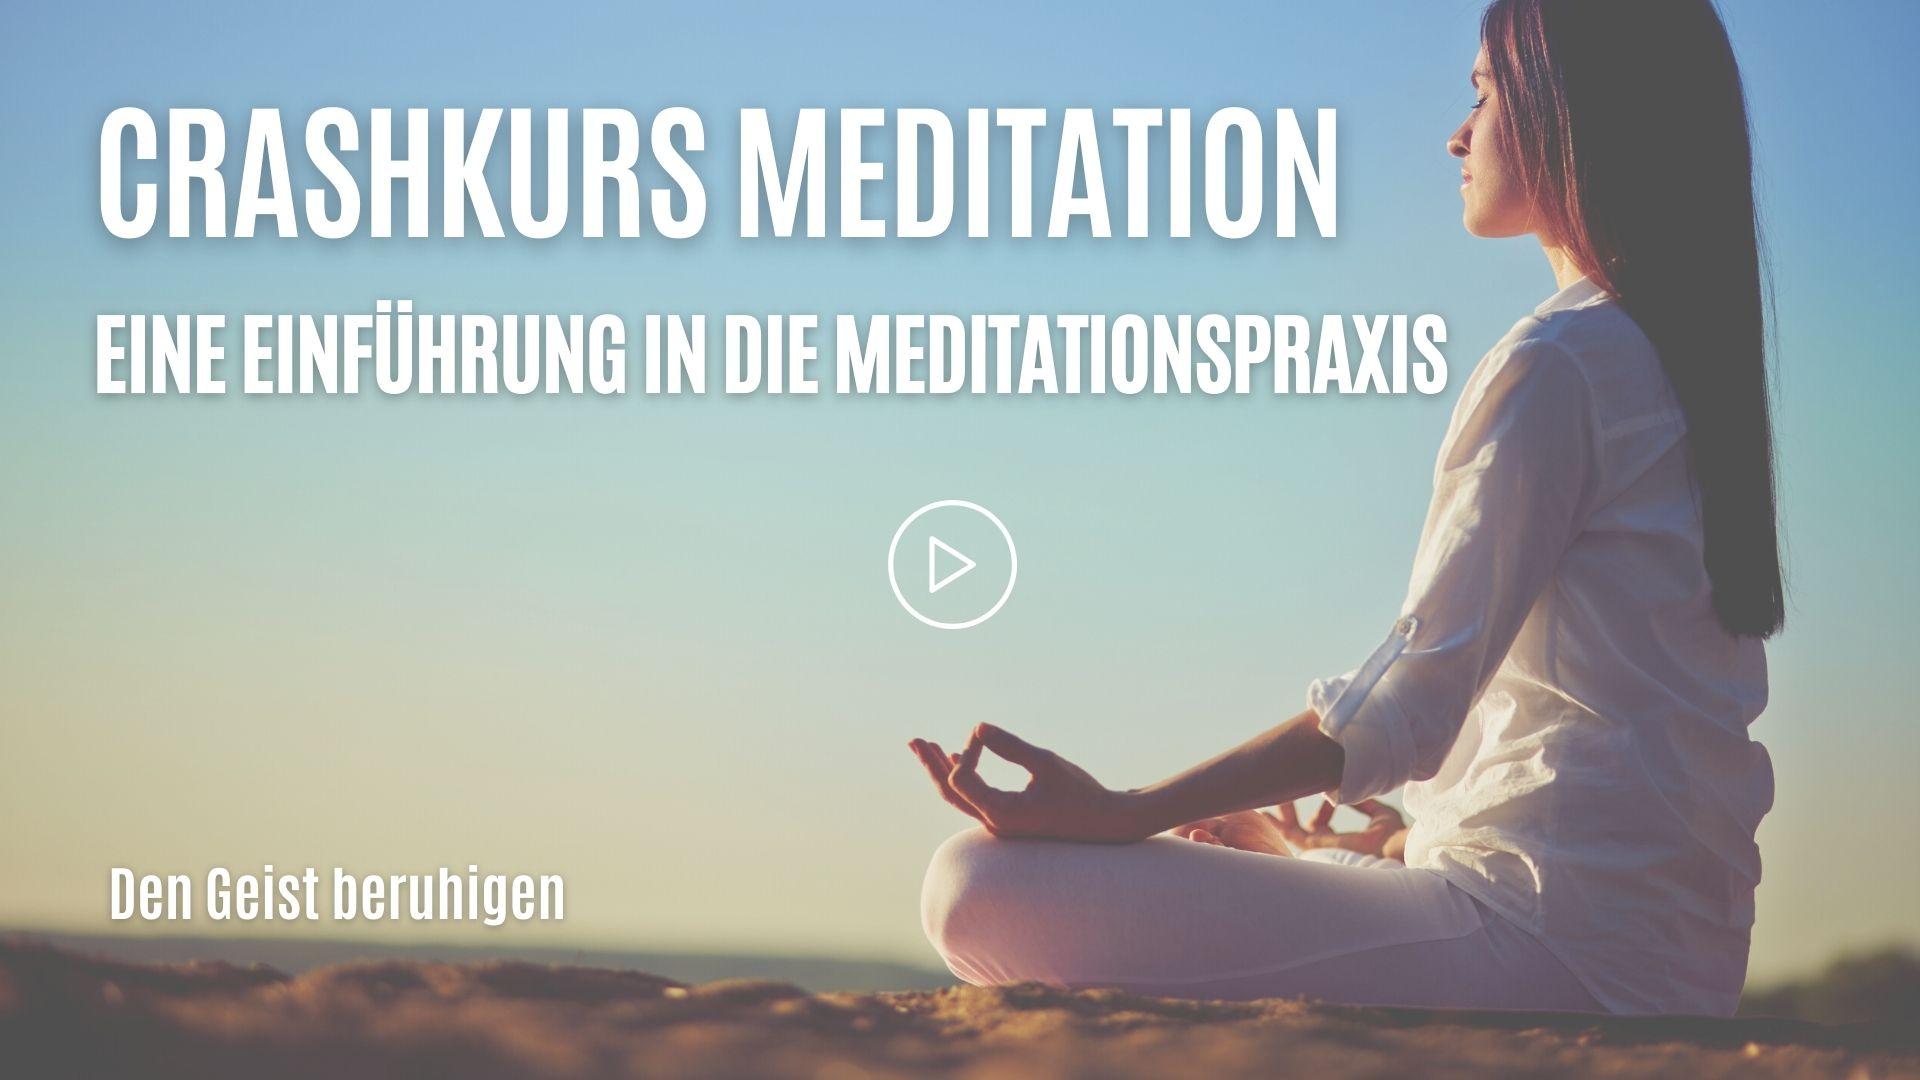 Crashkurs Meditation Newsletter